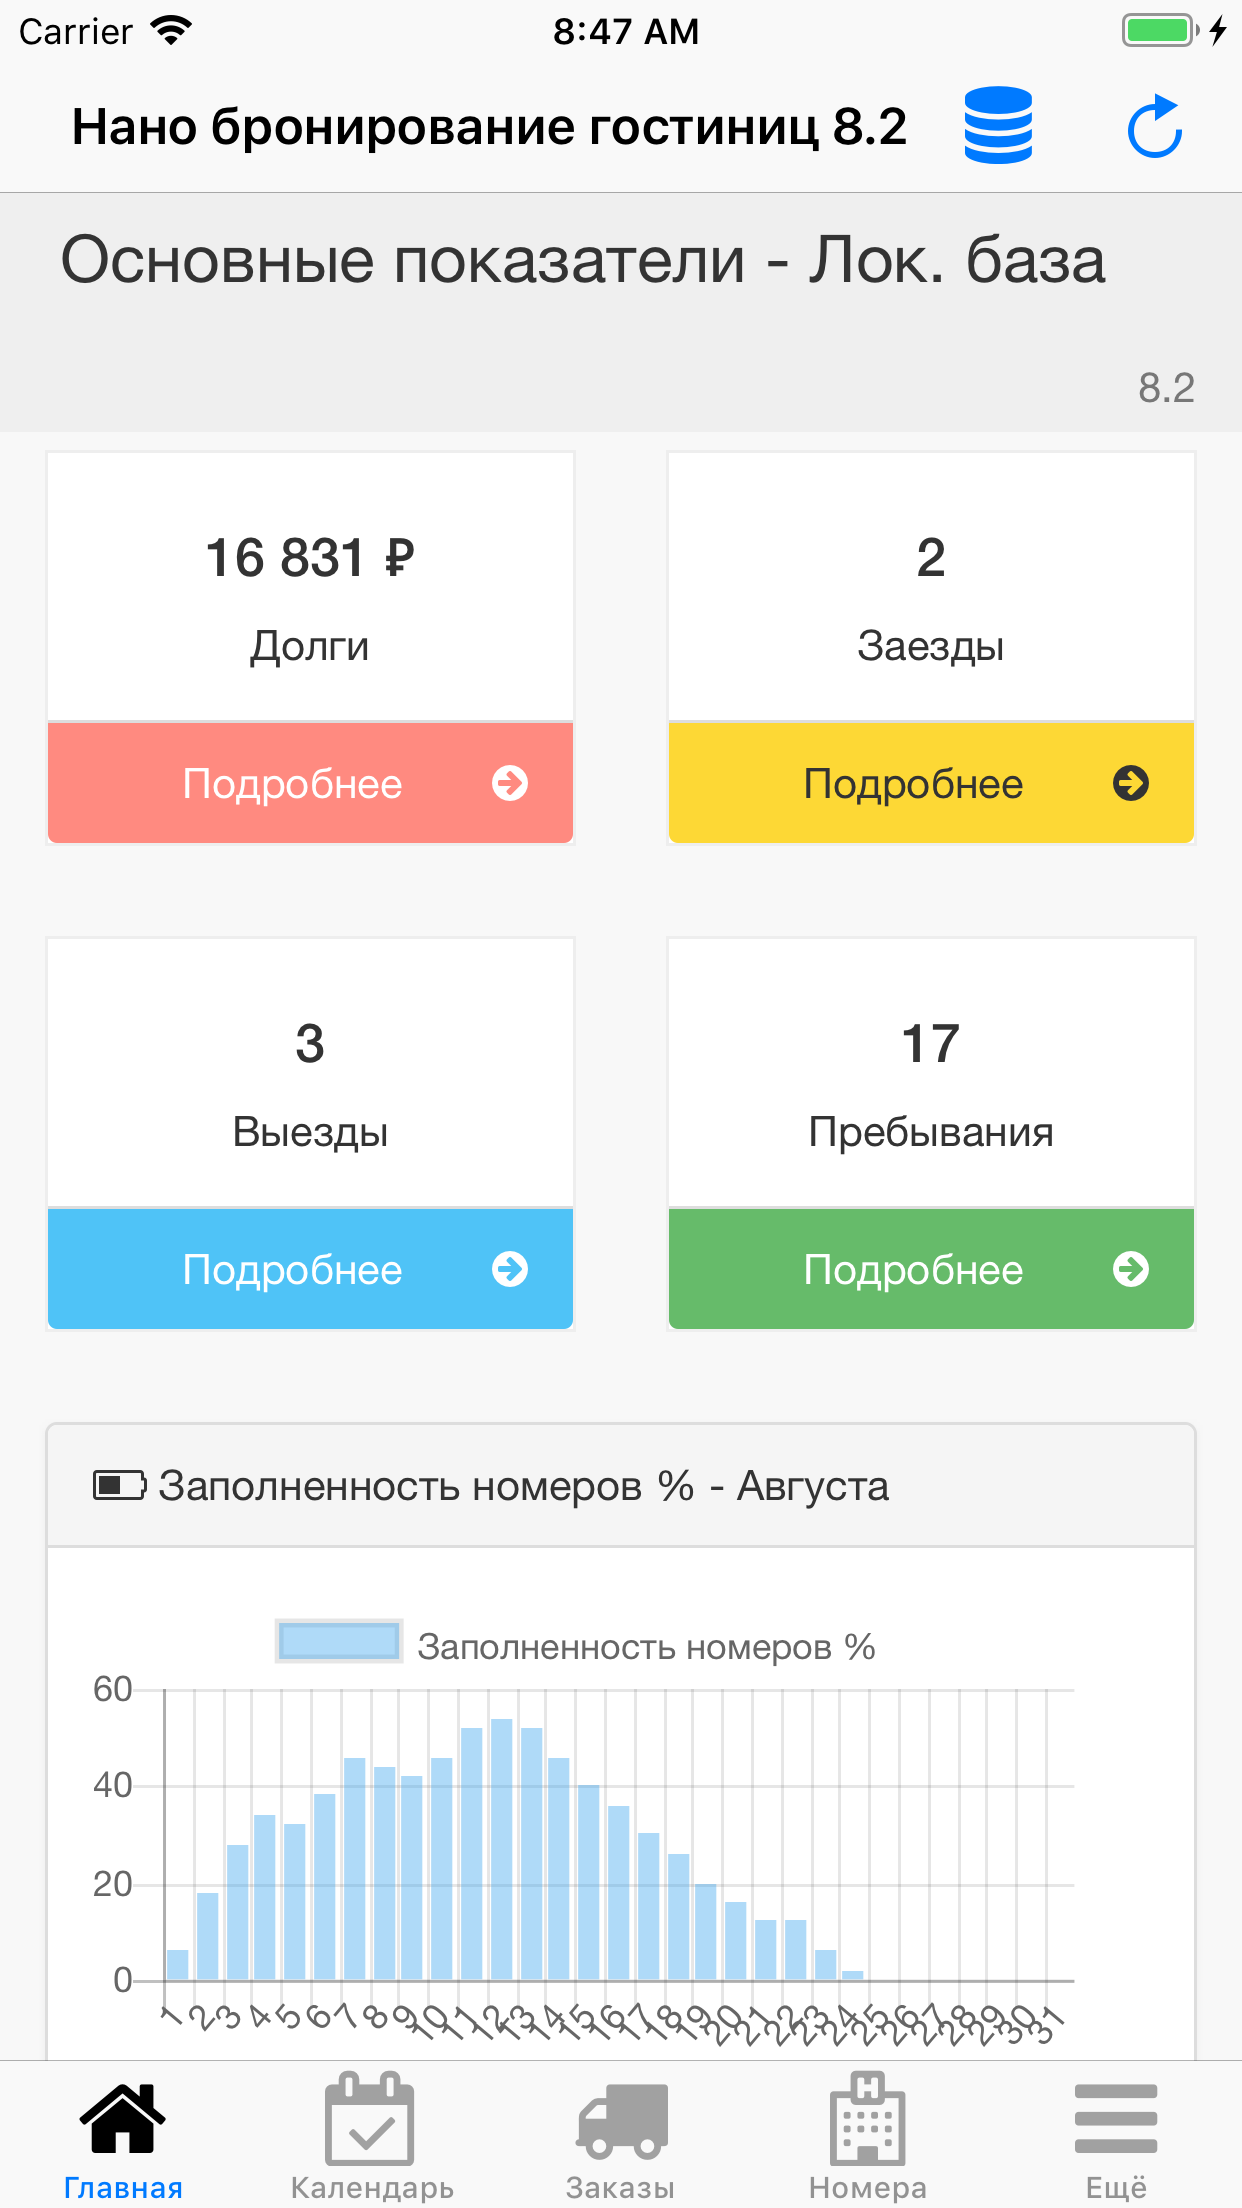 Нано Бронирование Гостиниц. Dashboard